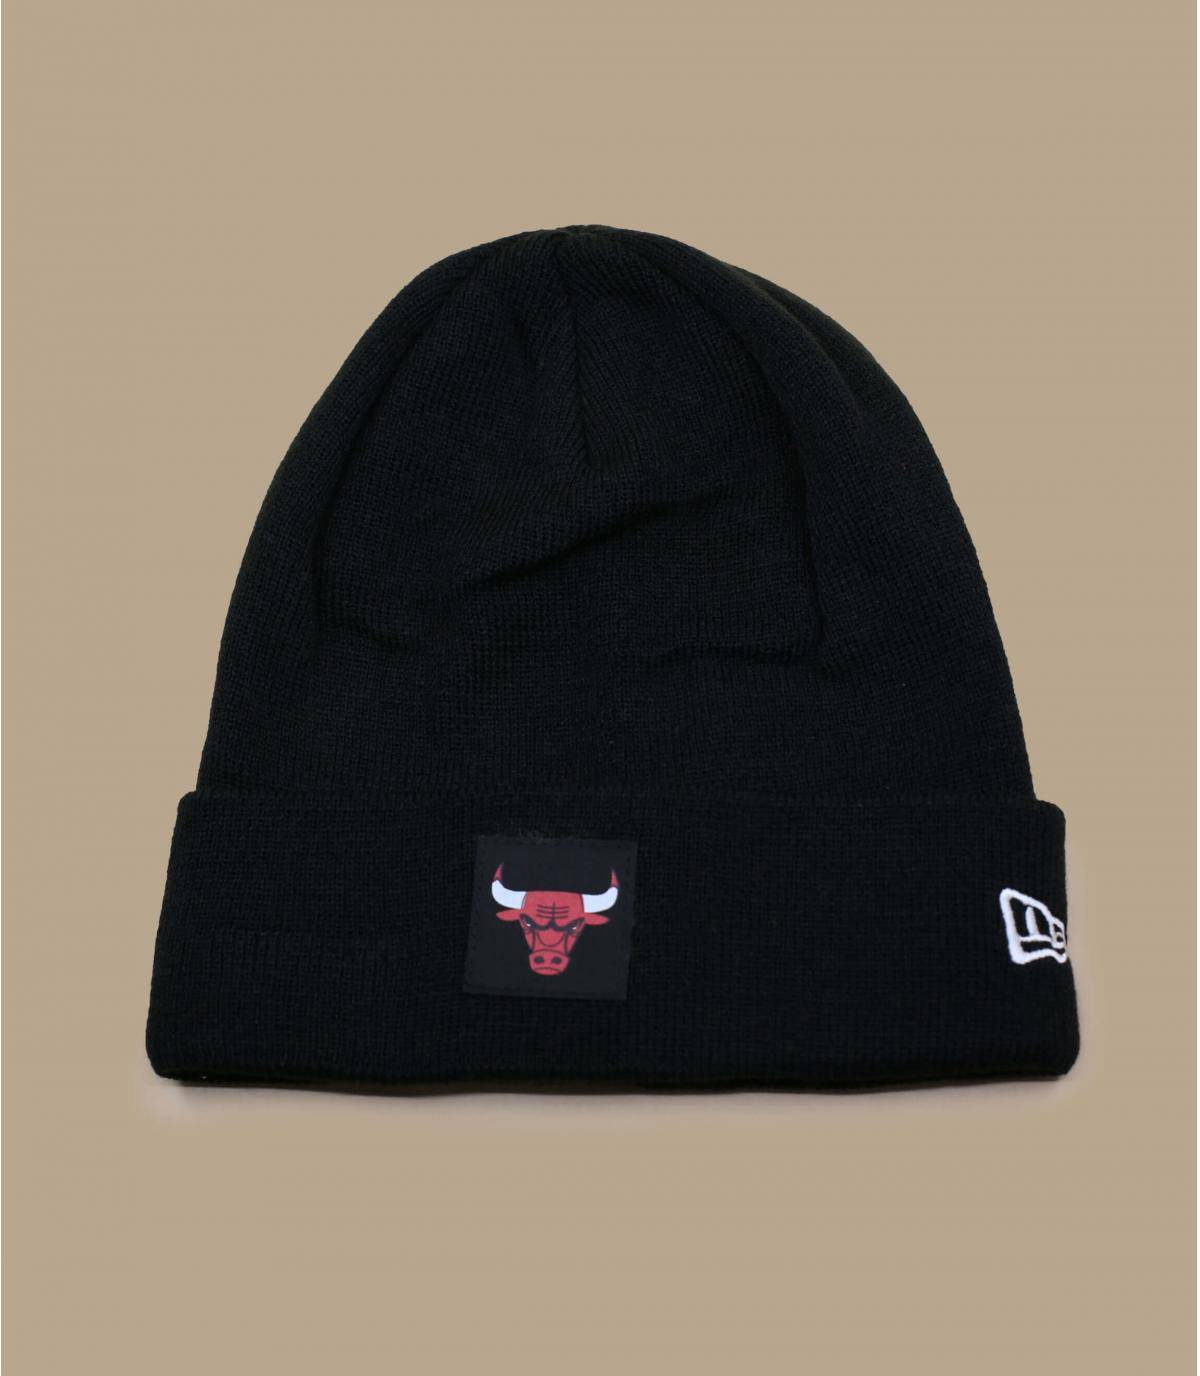 Black Bulls beanie